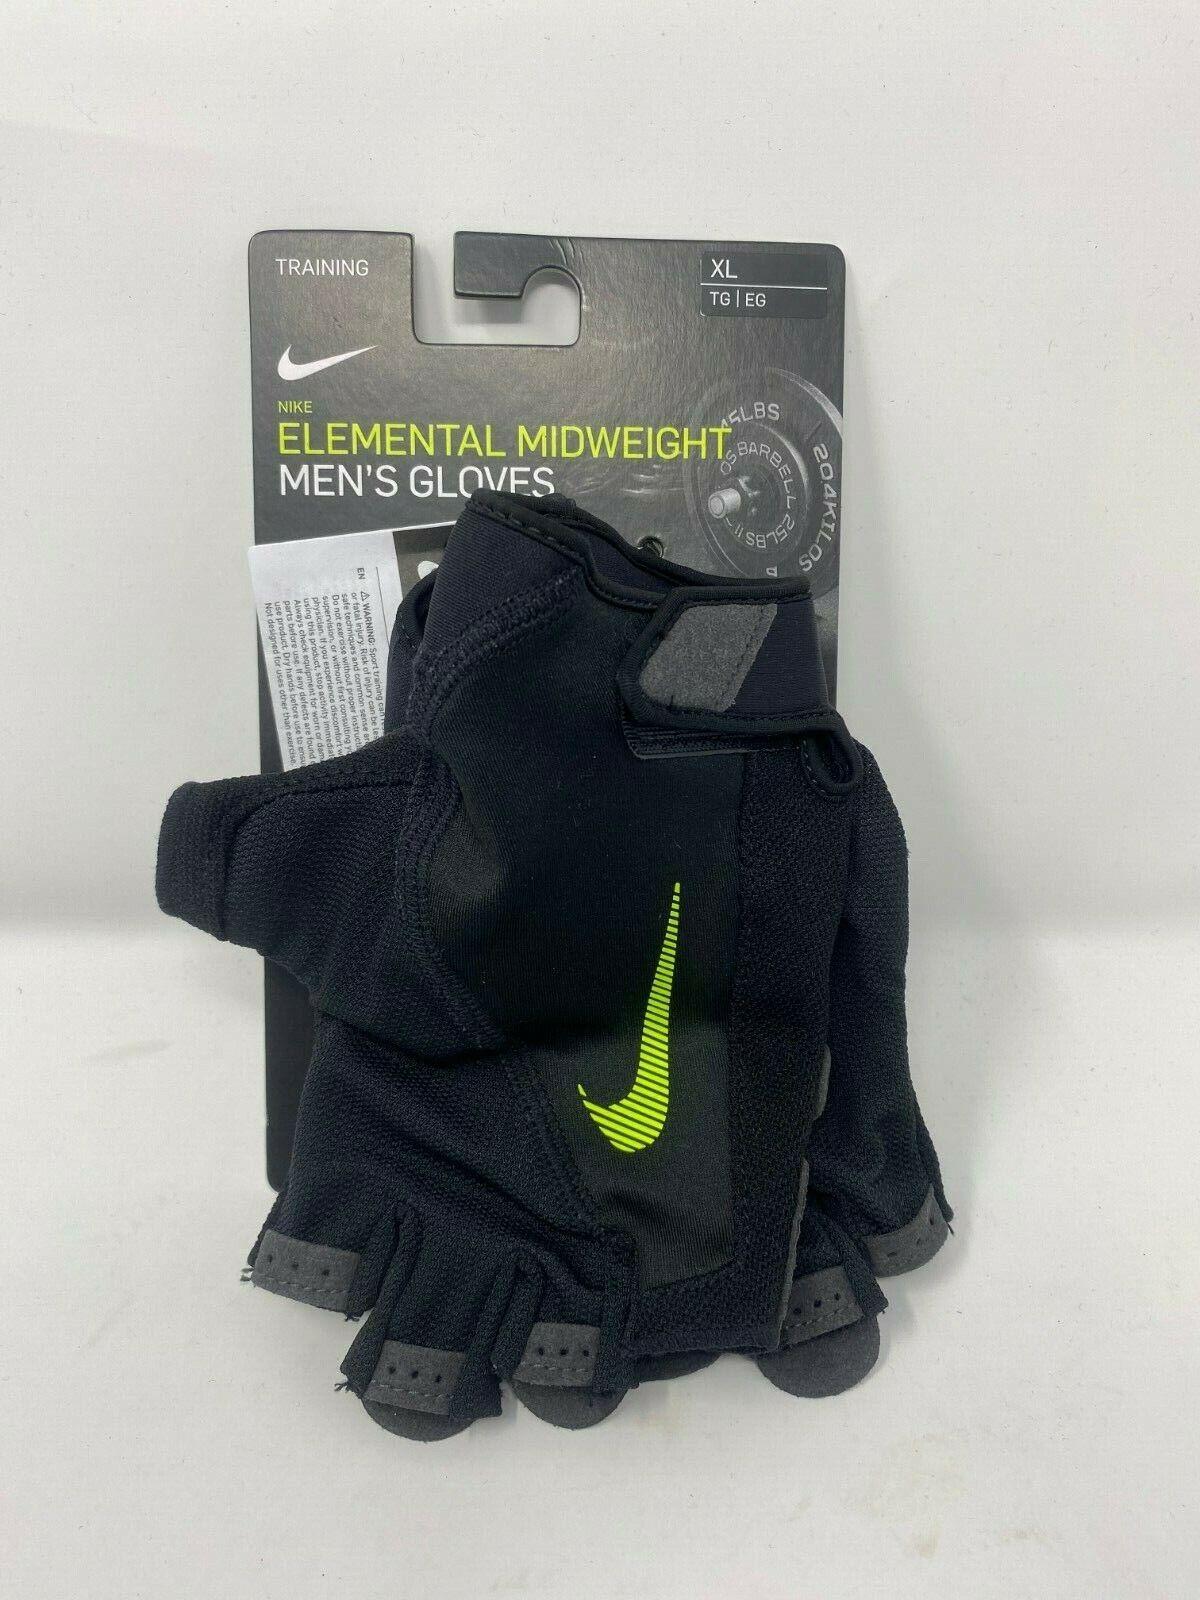 Nike Elemental Midweight Training Gloves Men's New Sz S, L,